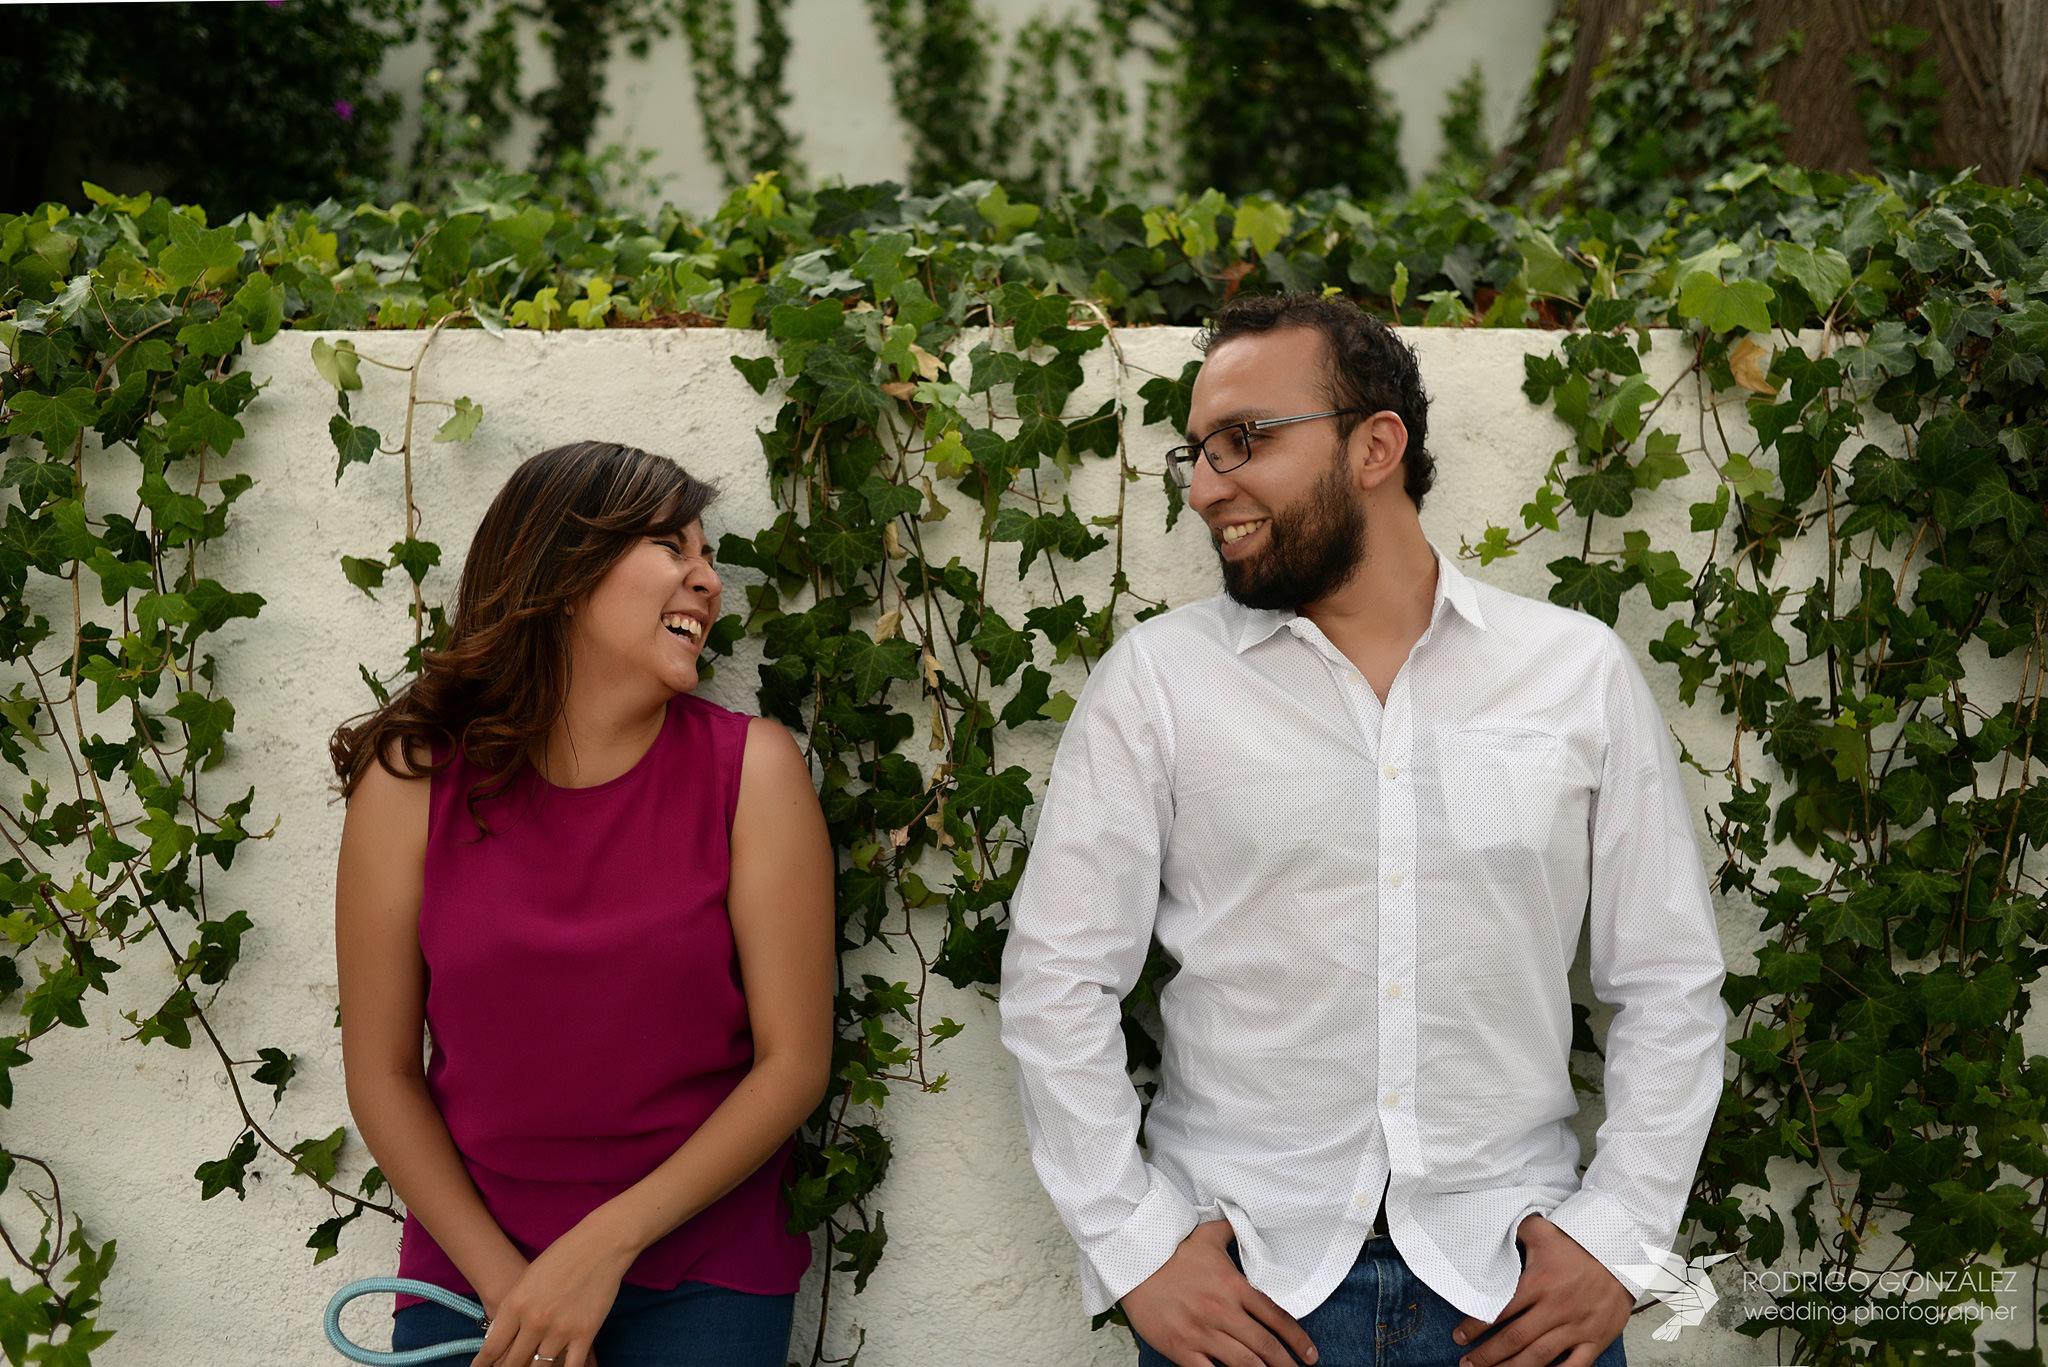 Fer+Luis-sesion-exhacienda-chautla-324